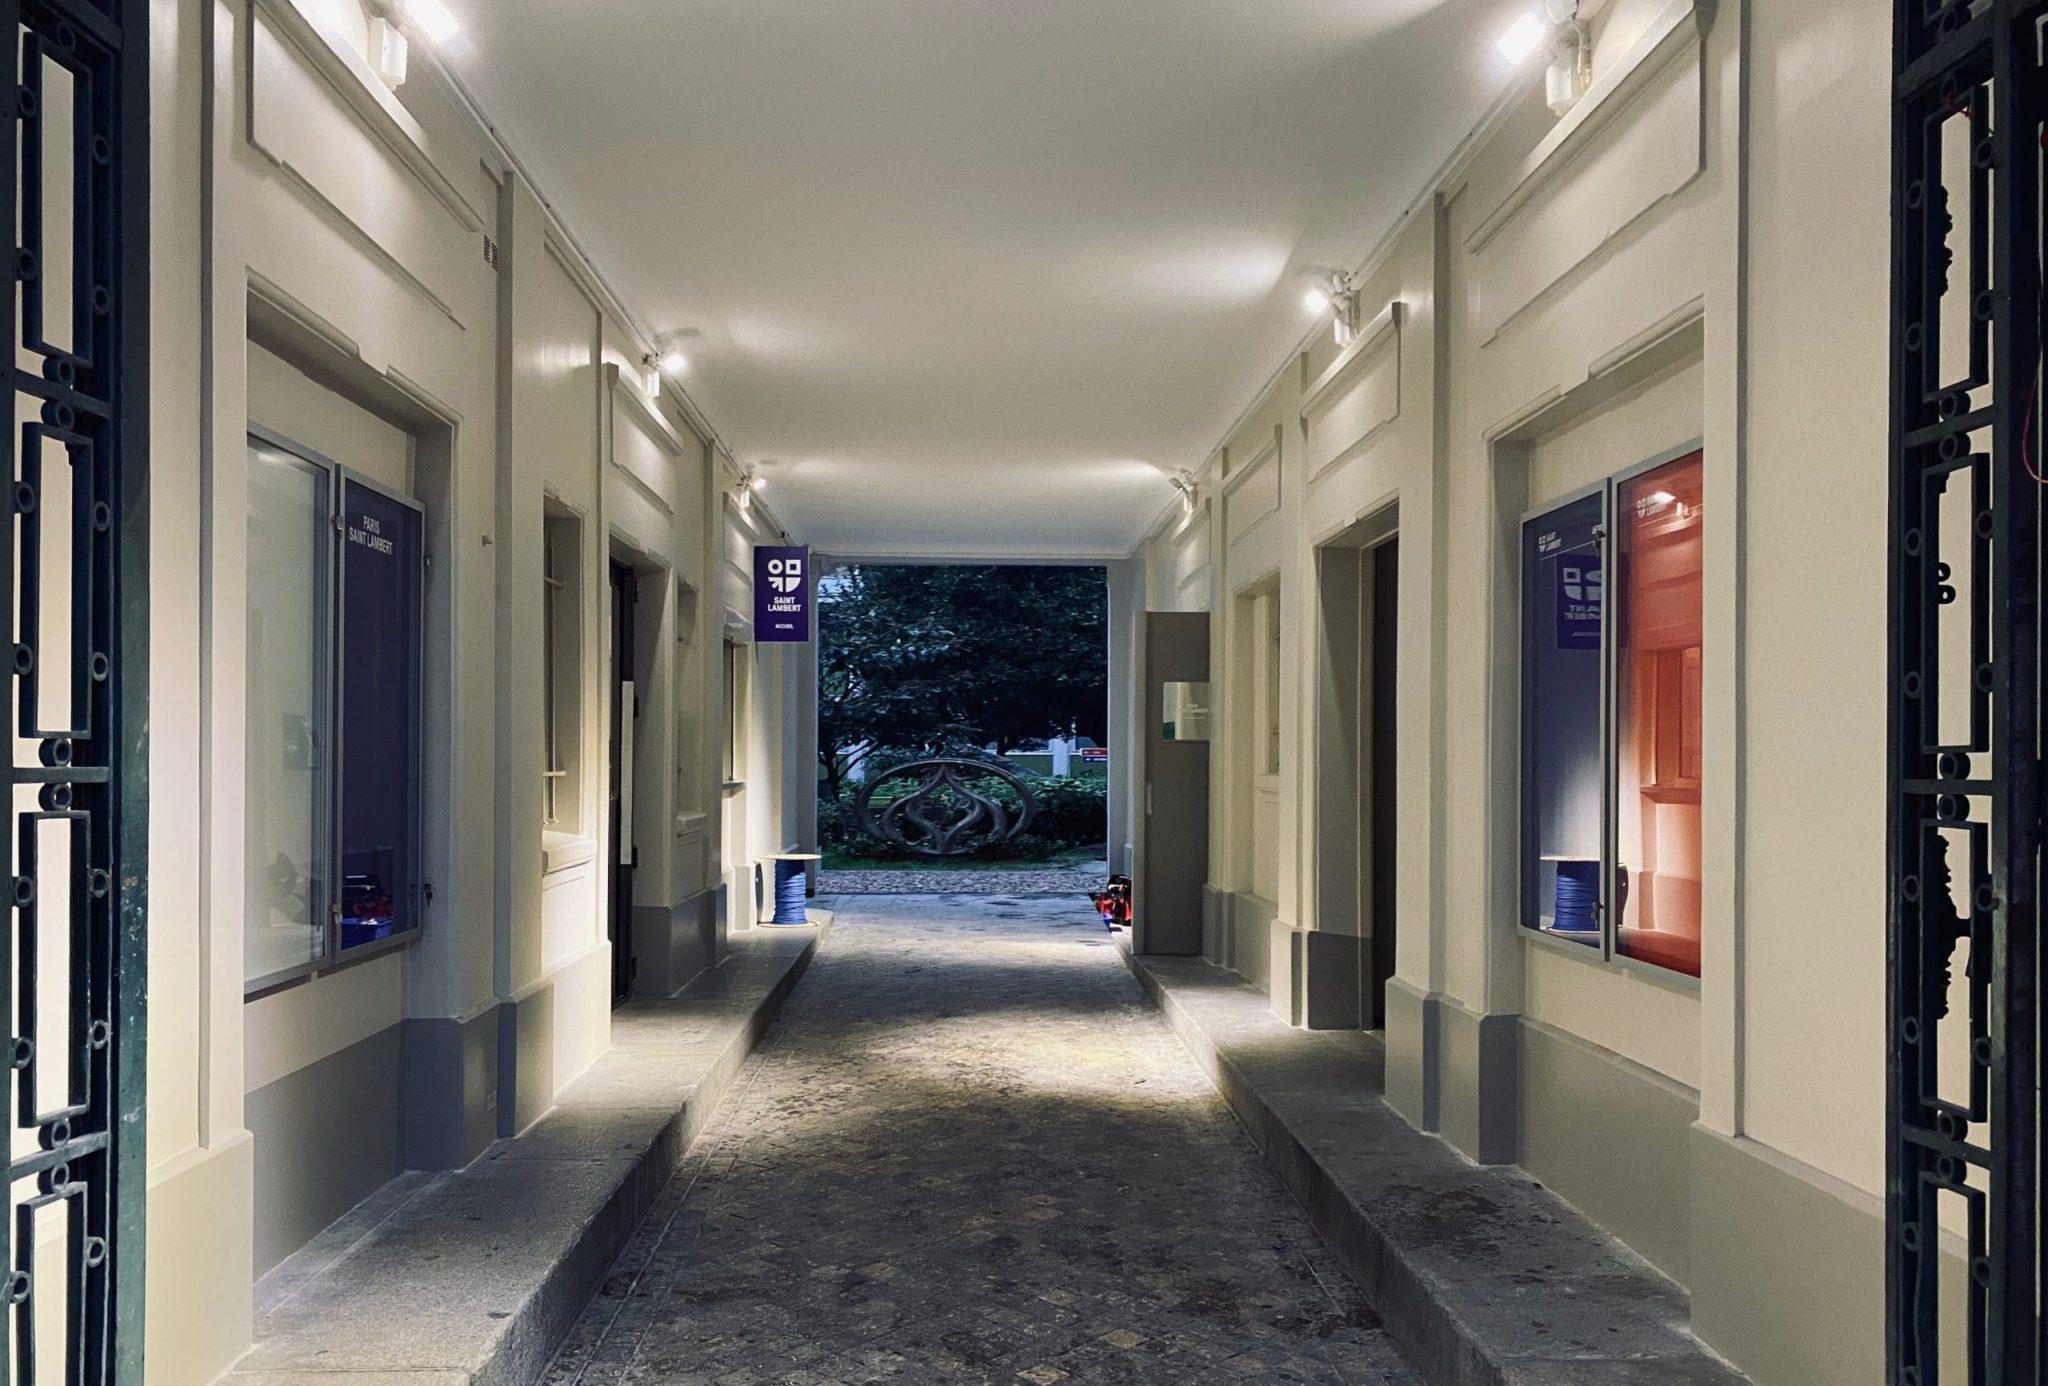 9 rue saint lambert formation aformaba